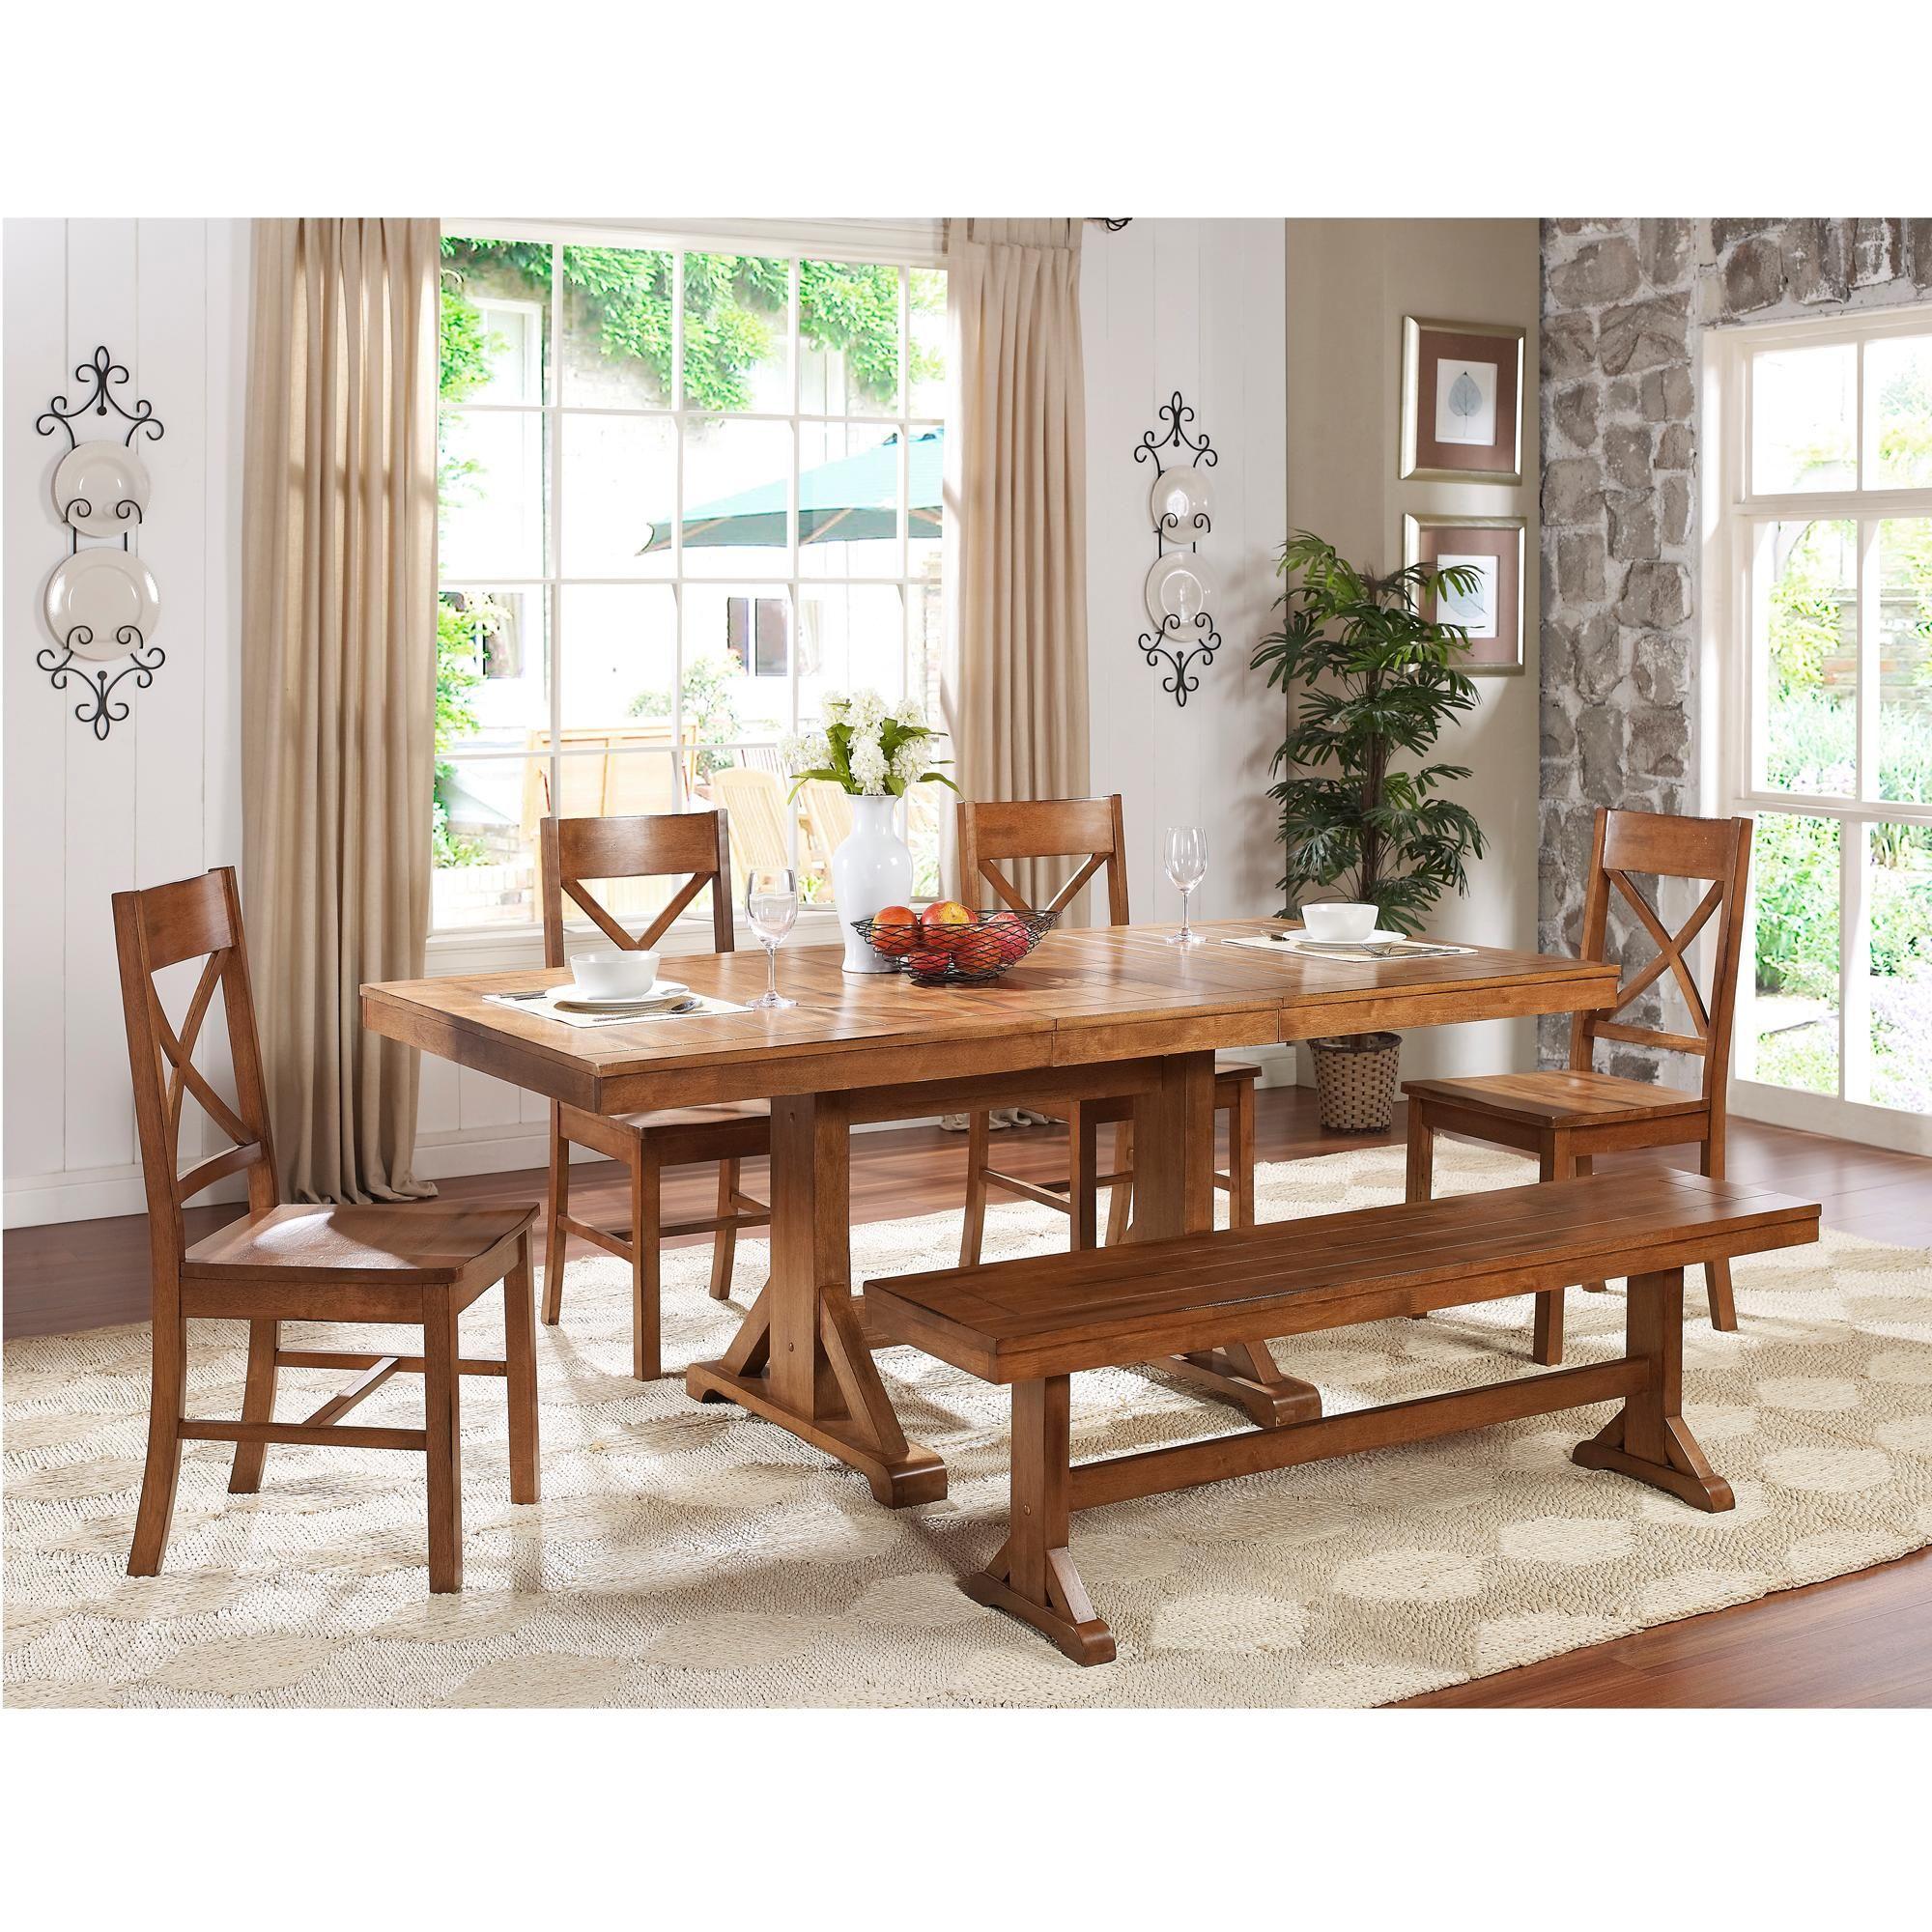 Amazon.com - 6-Piece Solid Wood Dining Set, Antique Brown ...